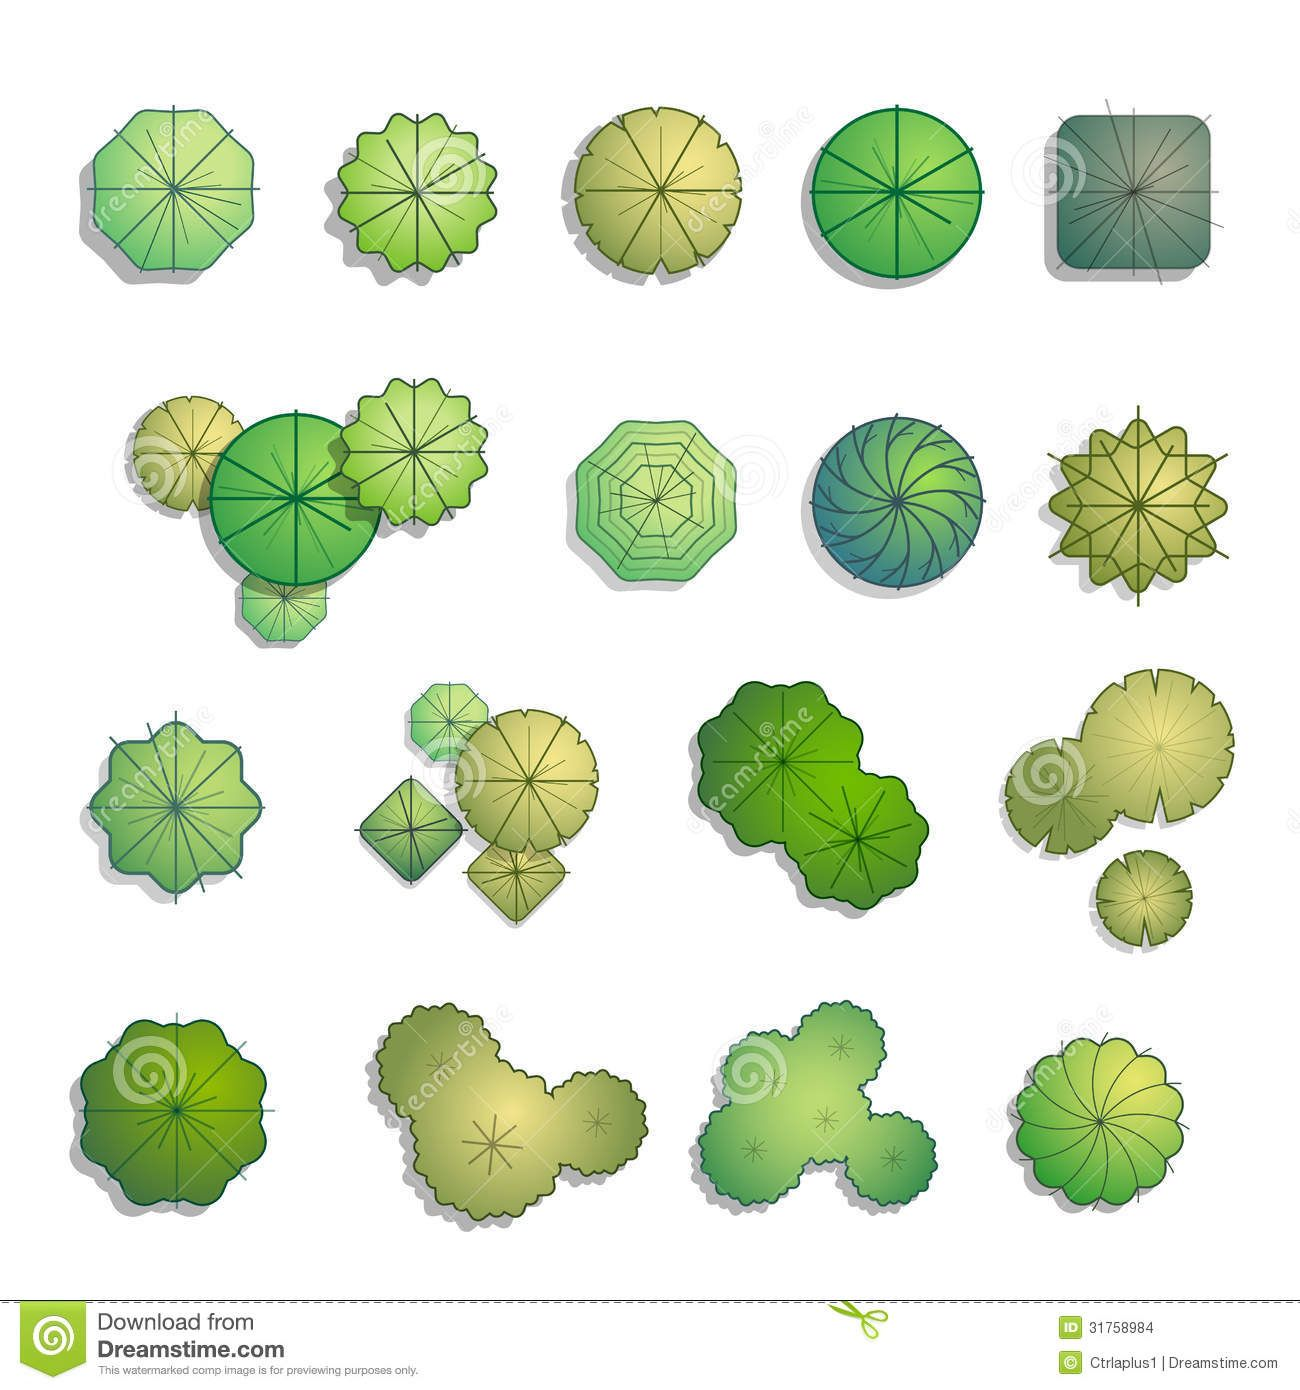 Shrub Graphic Symbols Diagram Sea Doo Jet Ski Parts Landscape Design Rendering Trees Top View For